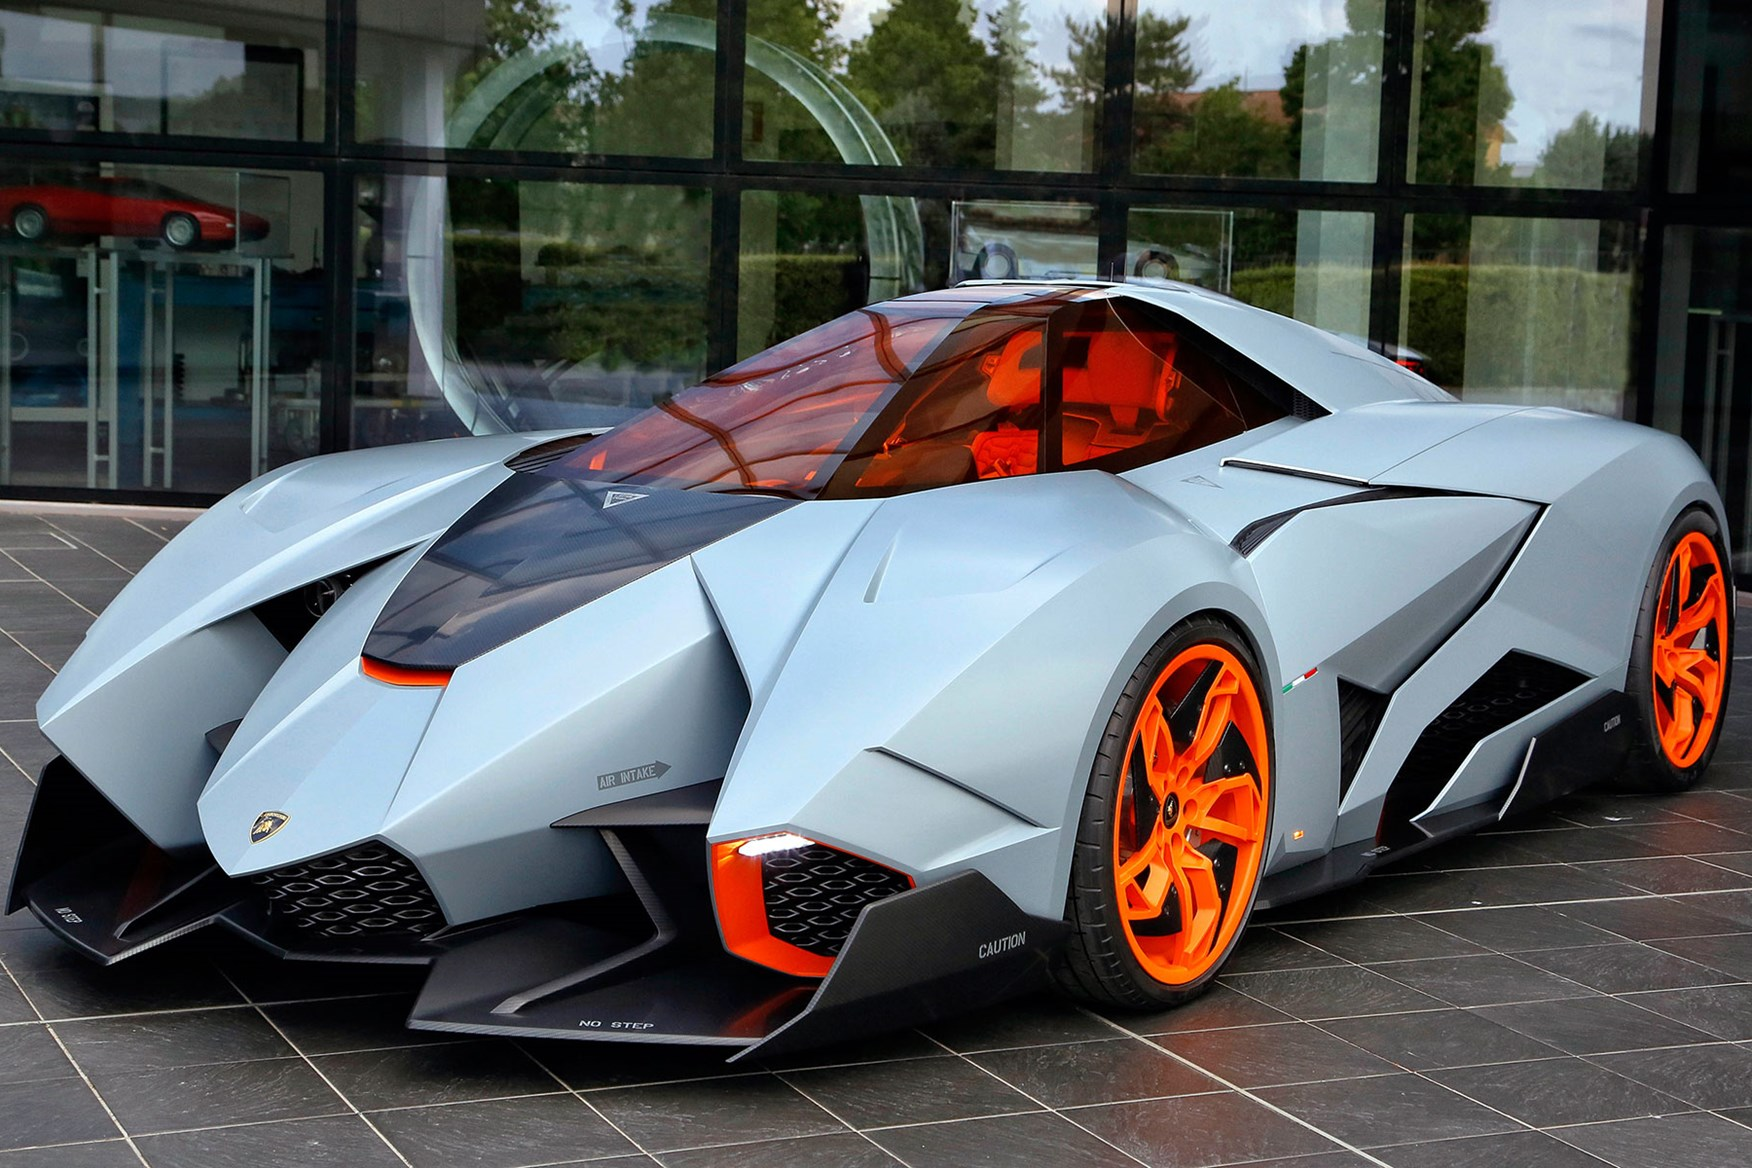 Lamborghini Jota Lamborghini Veneno Lamborghini Egoista Lamborghini Sesto  Elemento Lamborghini Aventador ...